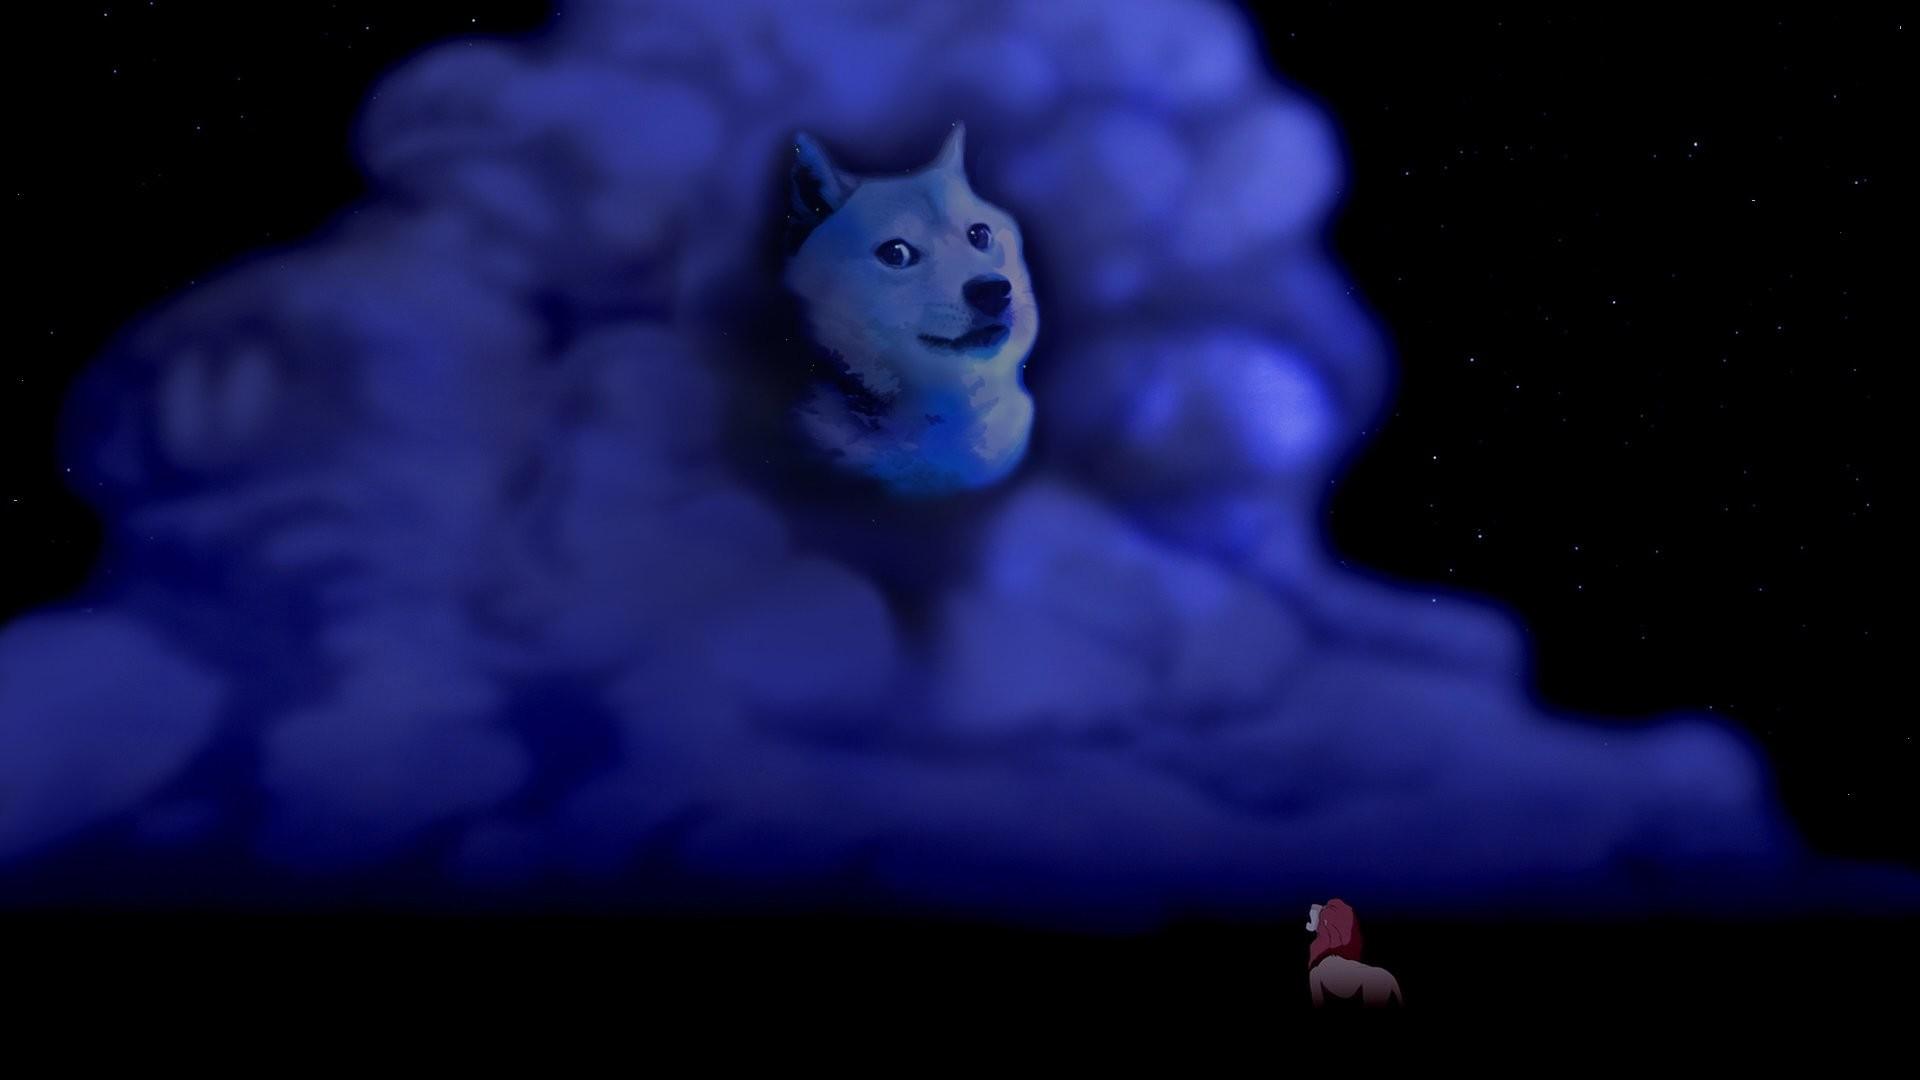 Lion King Clouds Night Doge Meme Dog disney wolf wolves fantasy wallpaper |  | 247995 | WallpaperUP